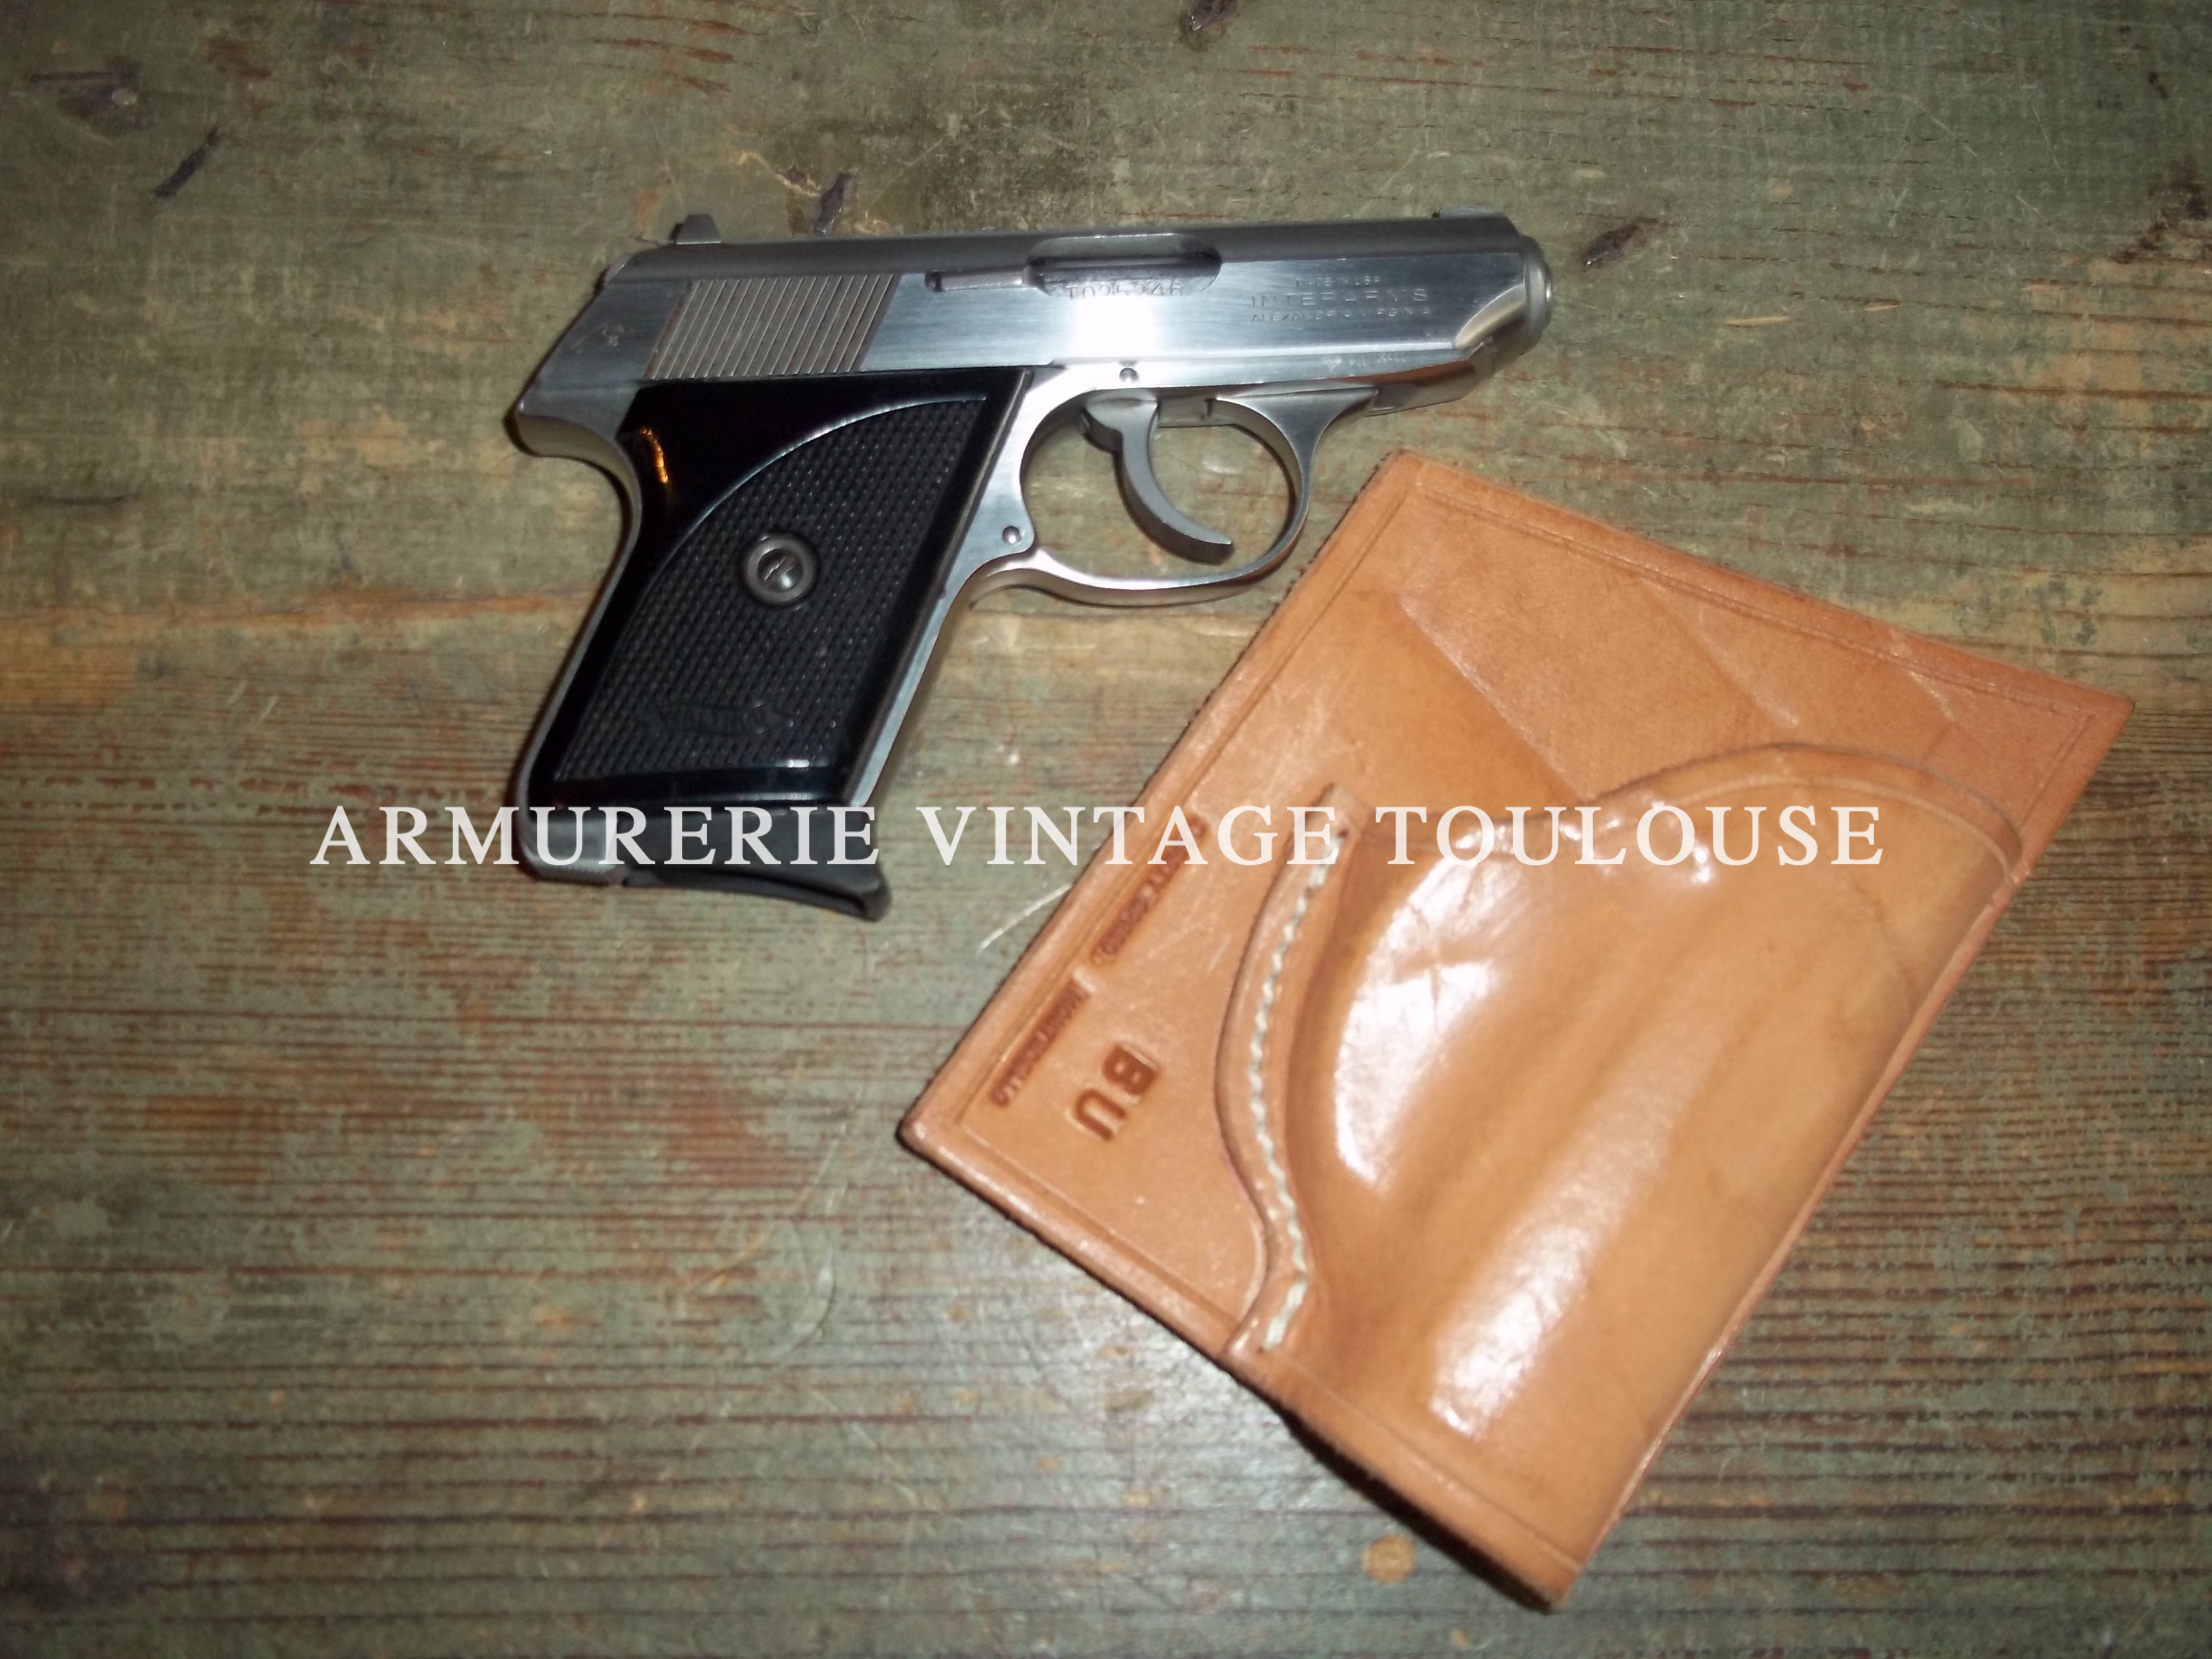 Adorable pistolet de poche Walther TPH calibre 22LR